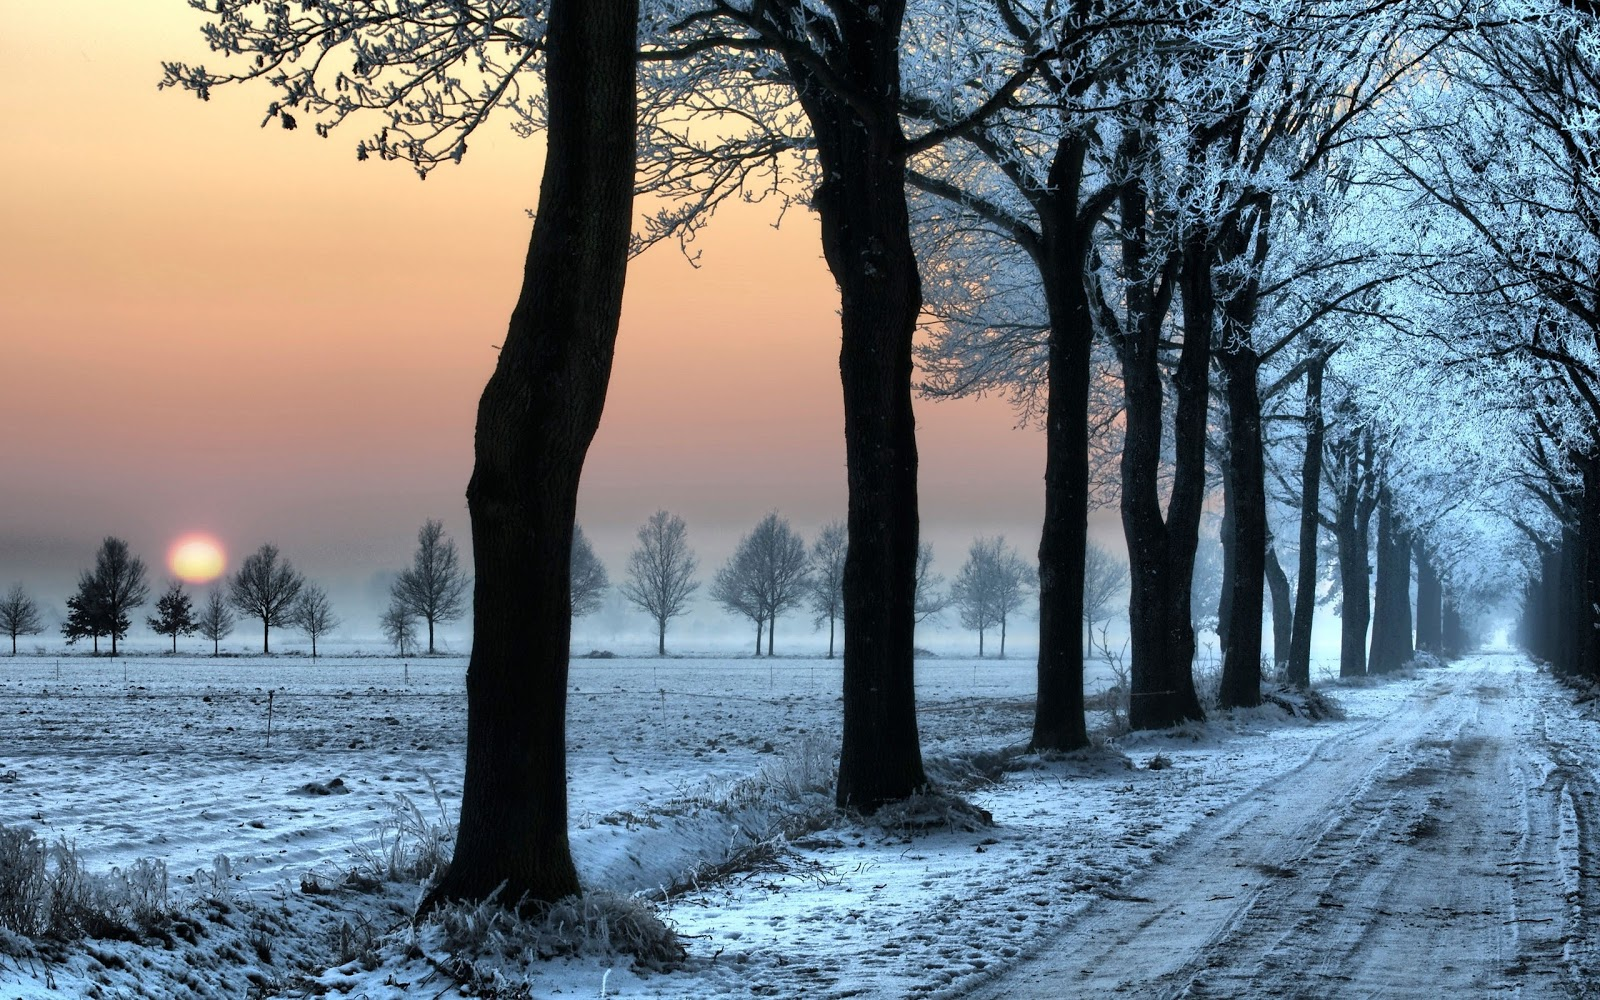 http://1.bp.blogspot.com/-Gb3p3L7Vvpo/UNg-ARrLEQI/AAAAAAAAB84/-2kudK3W9Tk/s1600/sunset_landscapes_nature_winter_snow_trees_skyline_roads_desktop_2560x1600_hd-wallpaper-1575538.jpg